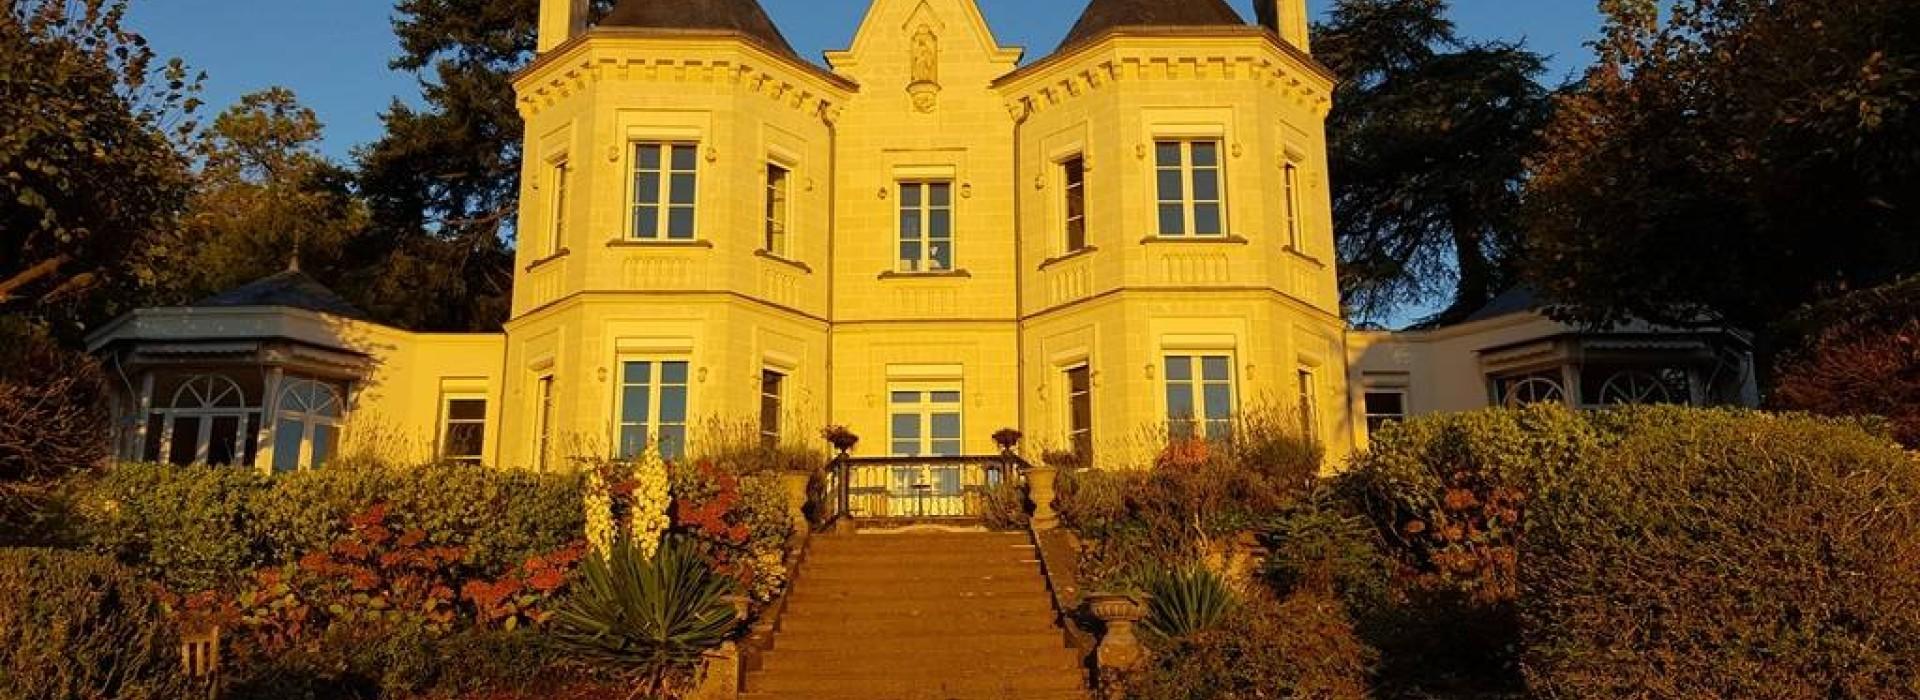 Chambres d 39 hotes villa belle couronne chambres d 39 h tes en for Chambre d hote xanton chassenon